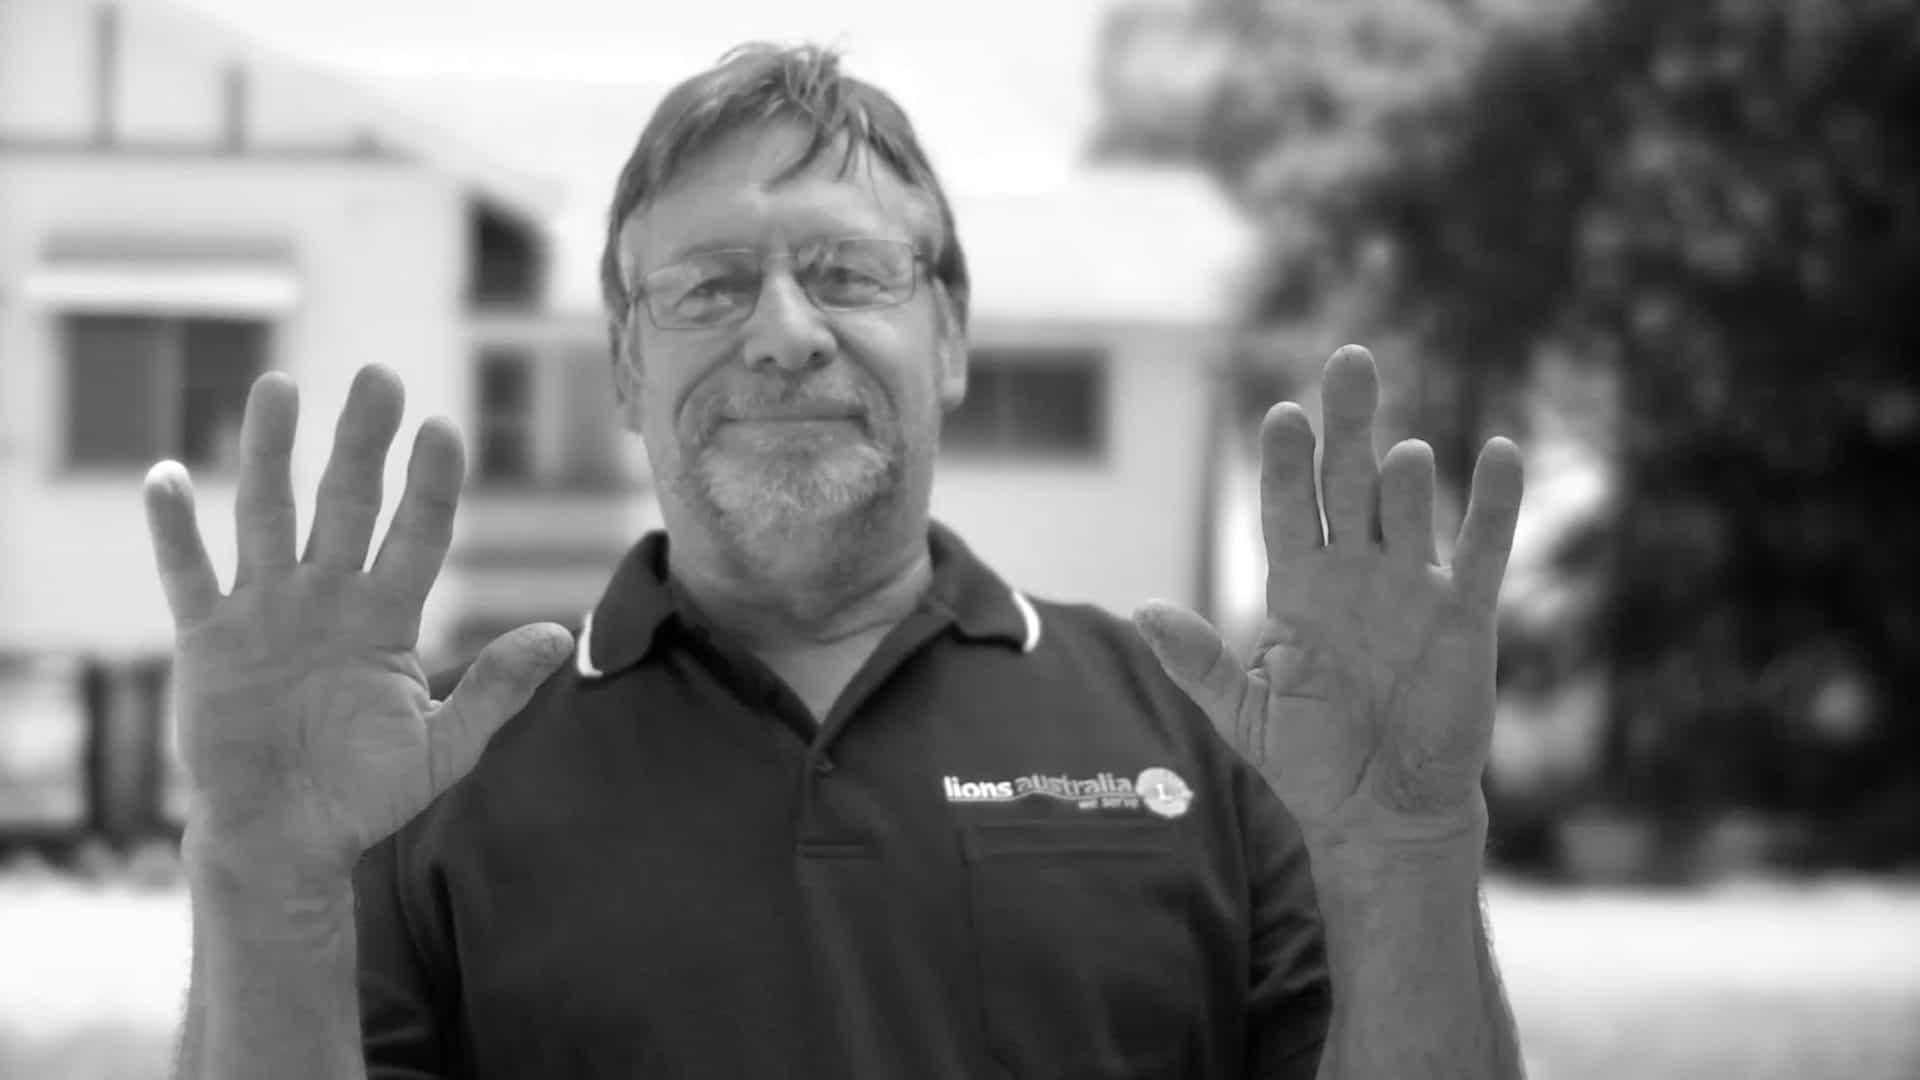 Two More Hands Lions Australia Film Content Production Sydney & Newcastle NSW